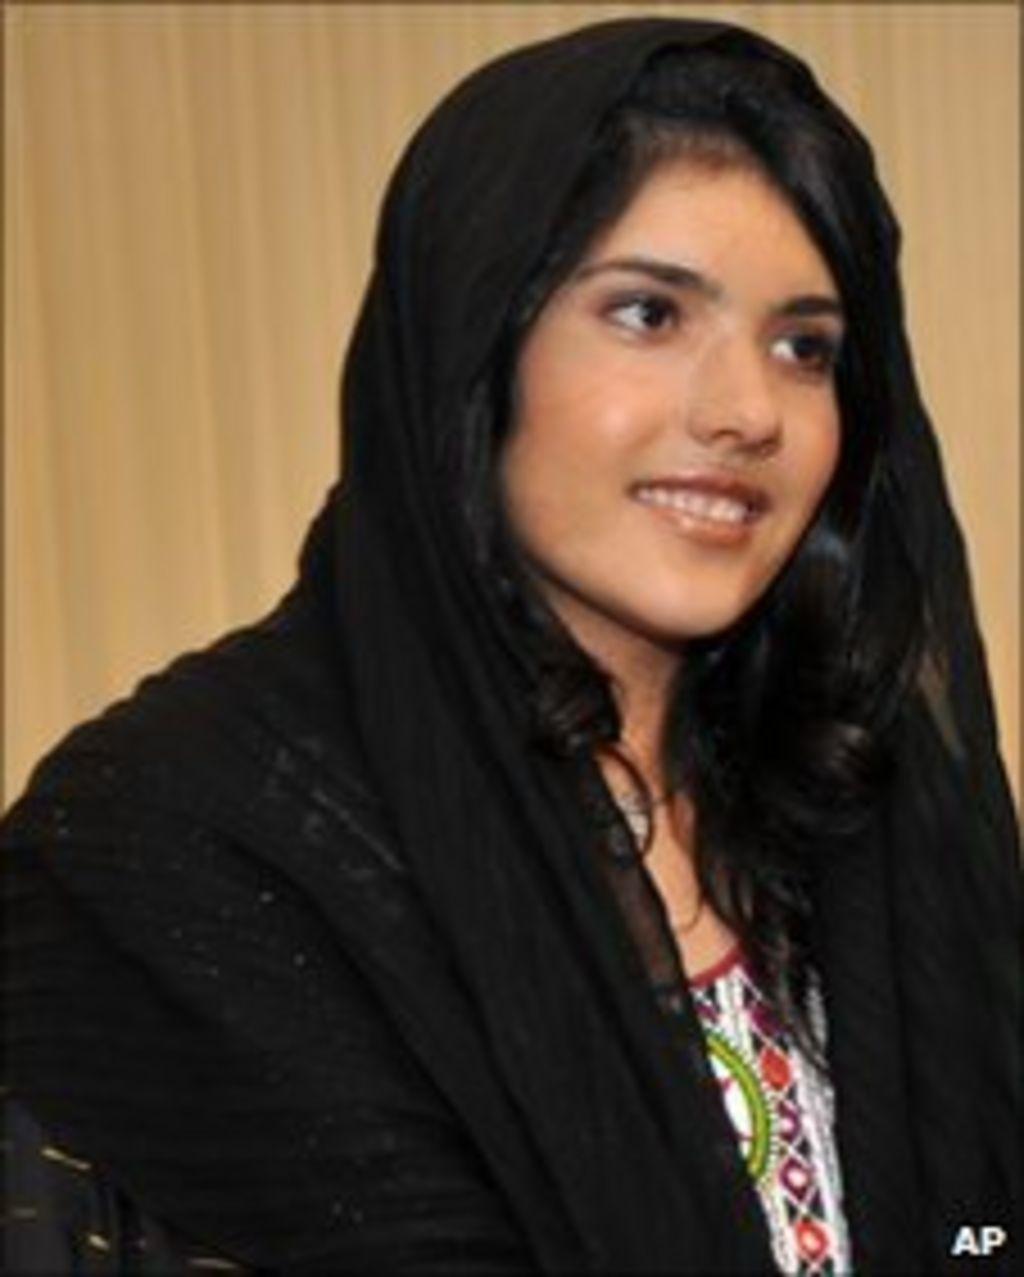 Aisha afghan teen what phrase